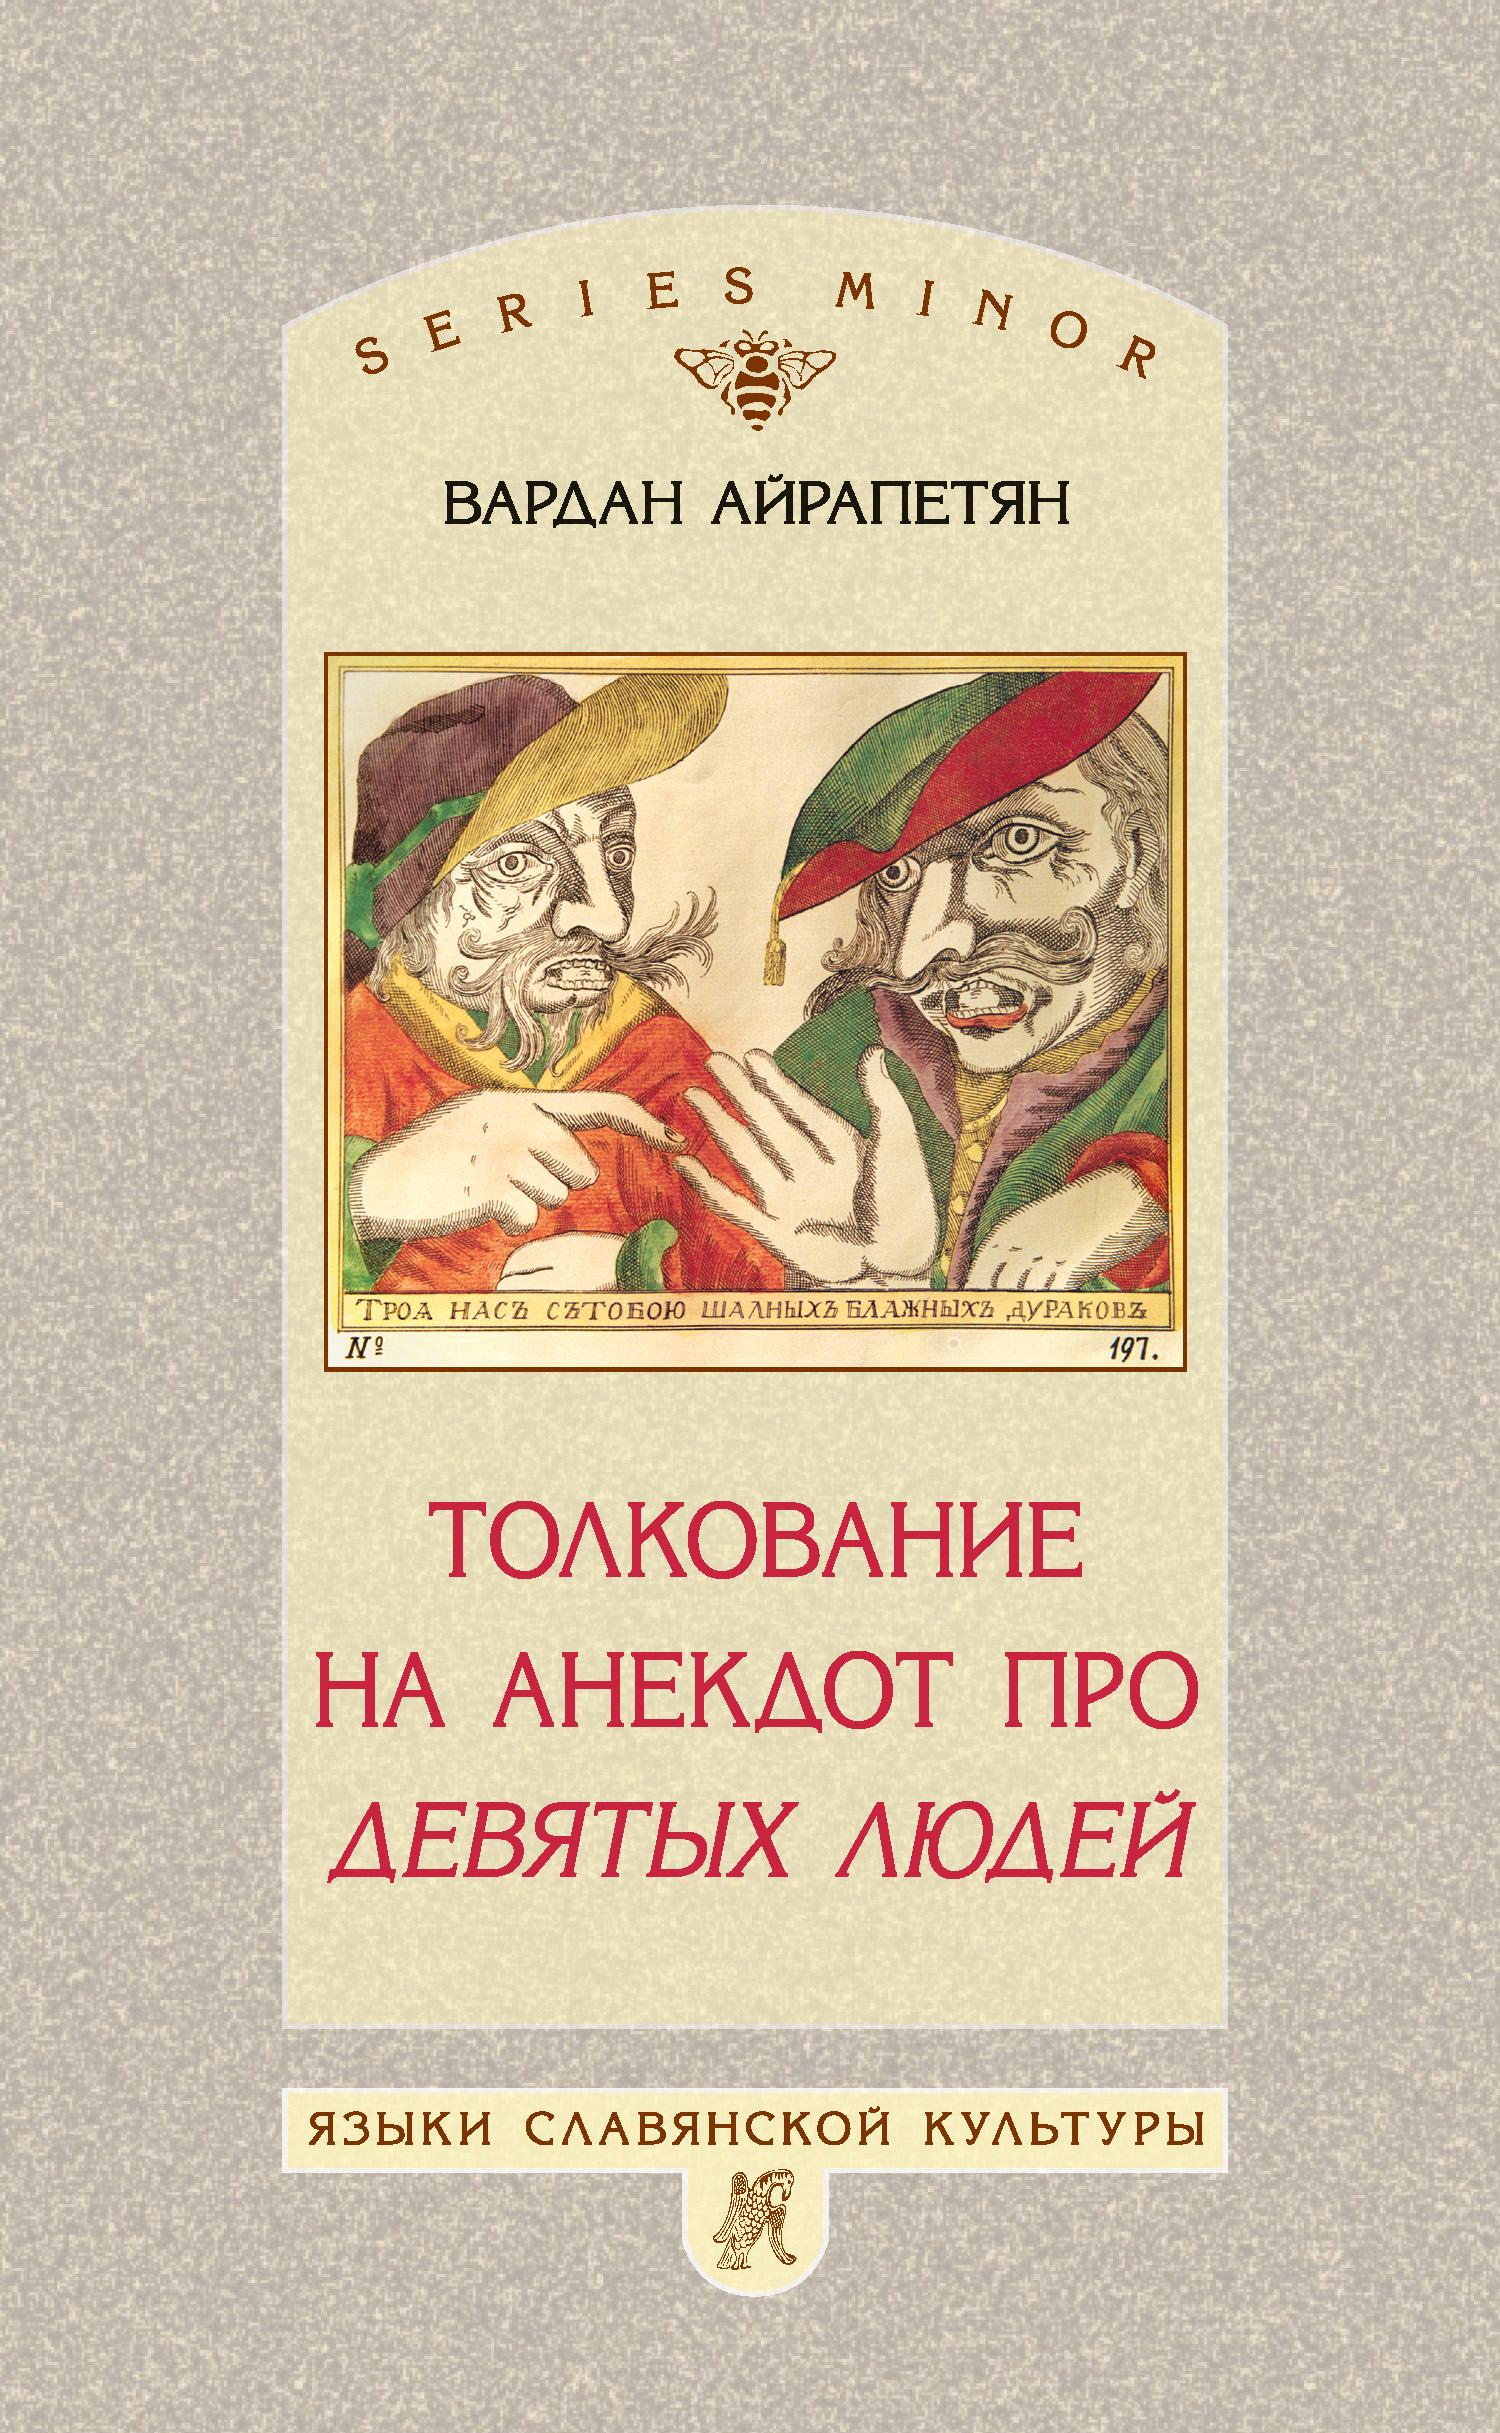 Вардан Айрапетян Толкование на анекдот про девятых людей таки еврэйский анекдот